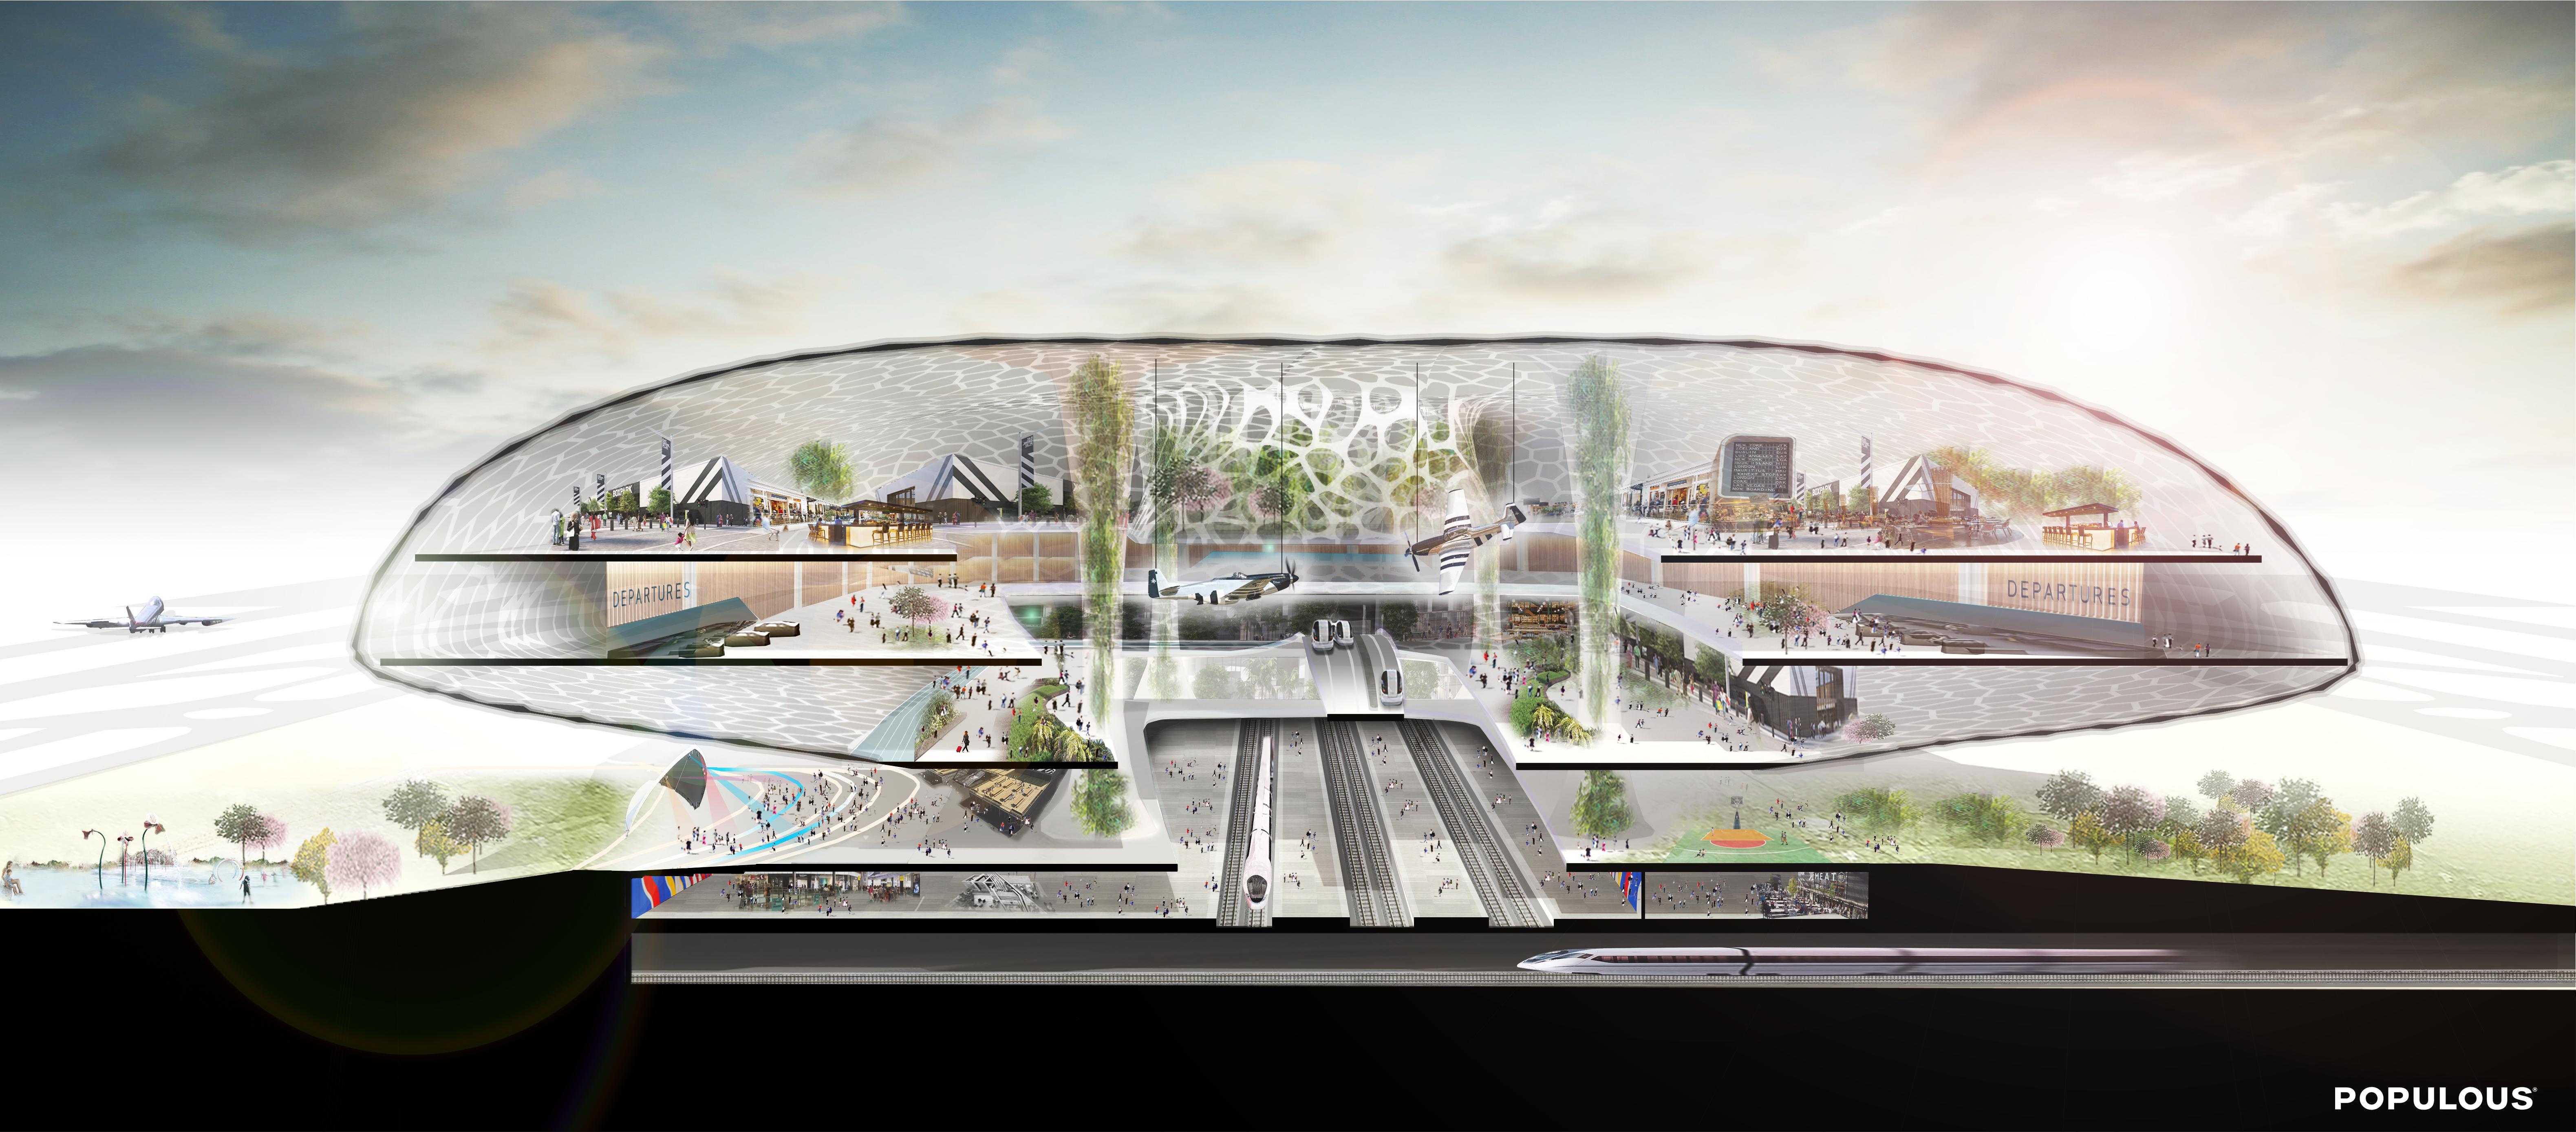 Koncepcja Populous - - Centralny Port Komunikacyjny (CPK; ang. Solidarity Transport Hub, STH)